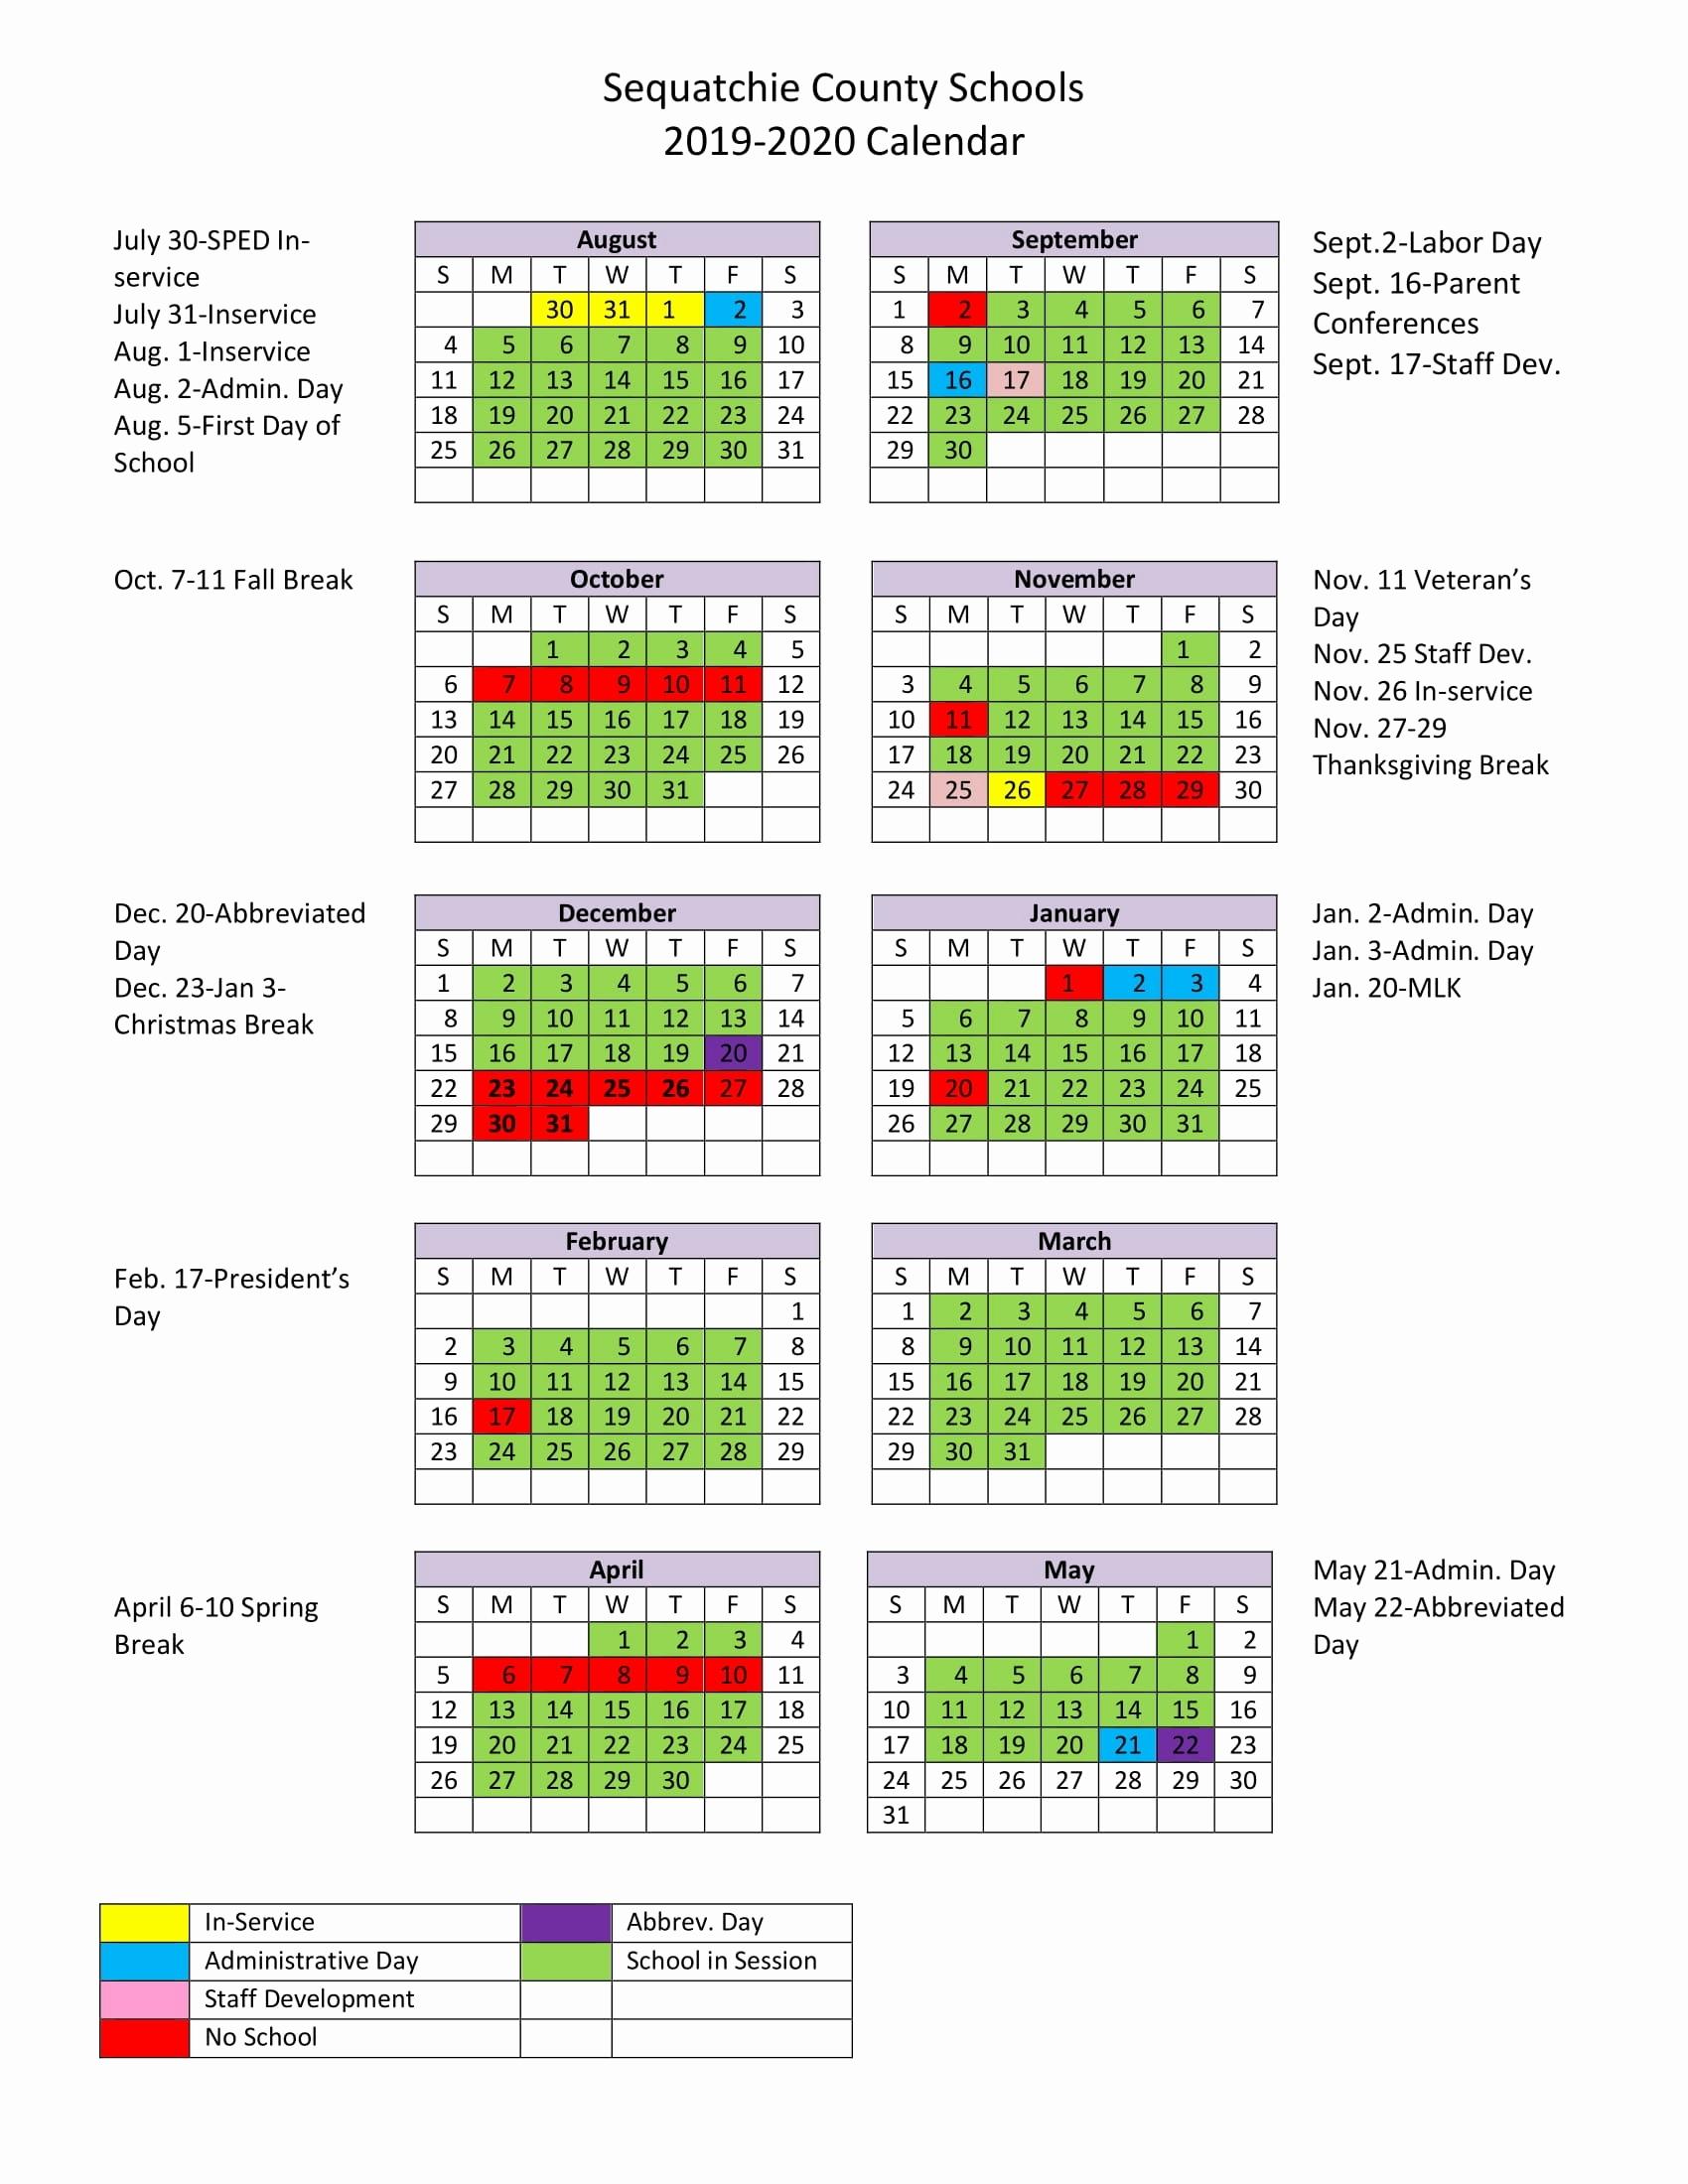 Mr. Mccluskey's Class Lausd 2020 Calendar – Get Your Calendar Printable